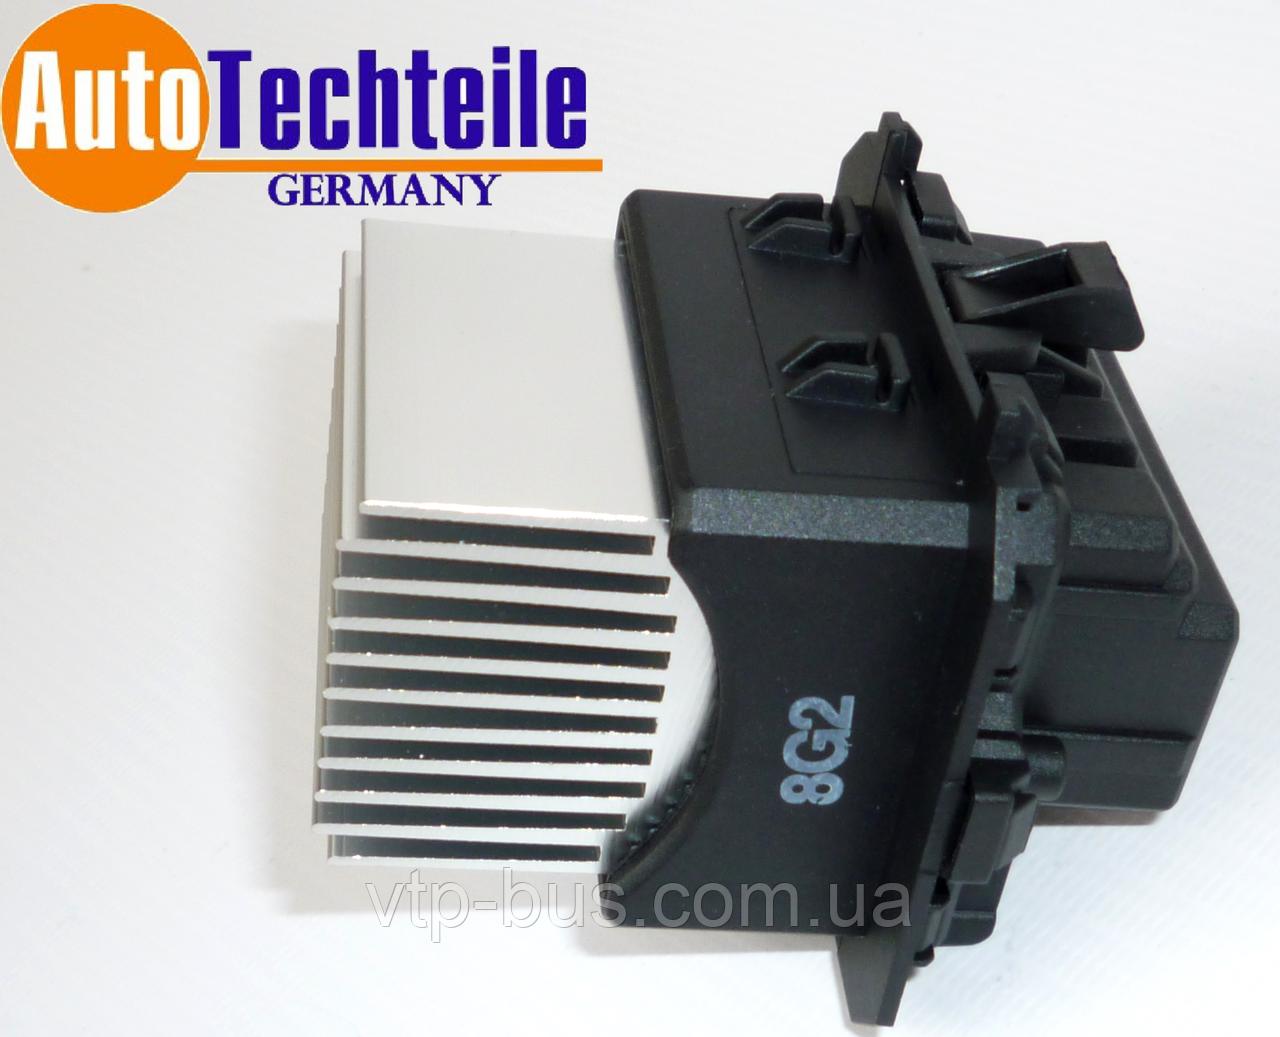 Резистор скорости вращения вентилятора на Renault Trafic III 1.6dCi с 2014... AutoTechteile (Германия) 5090111